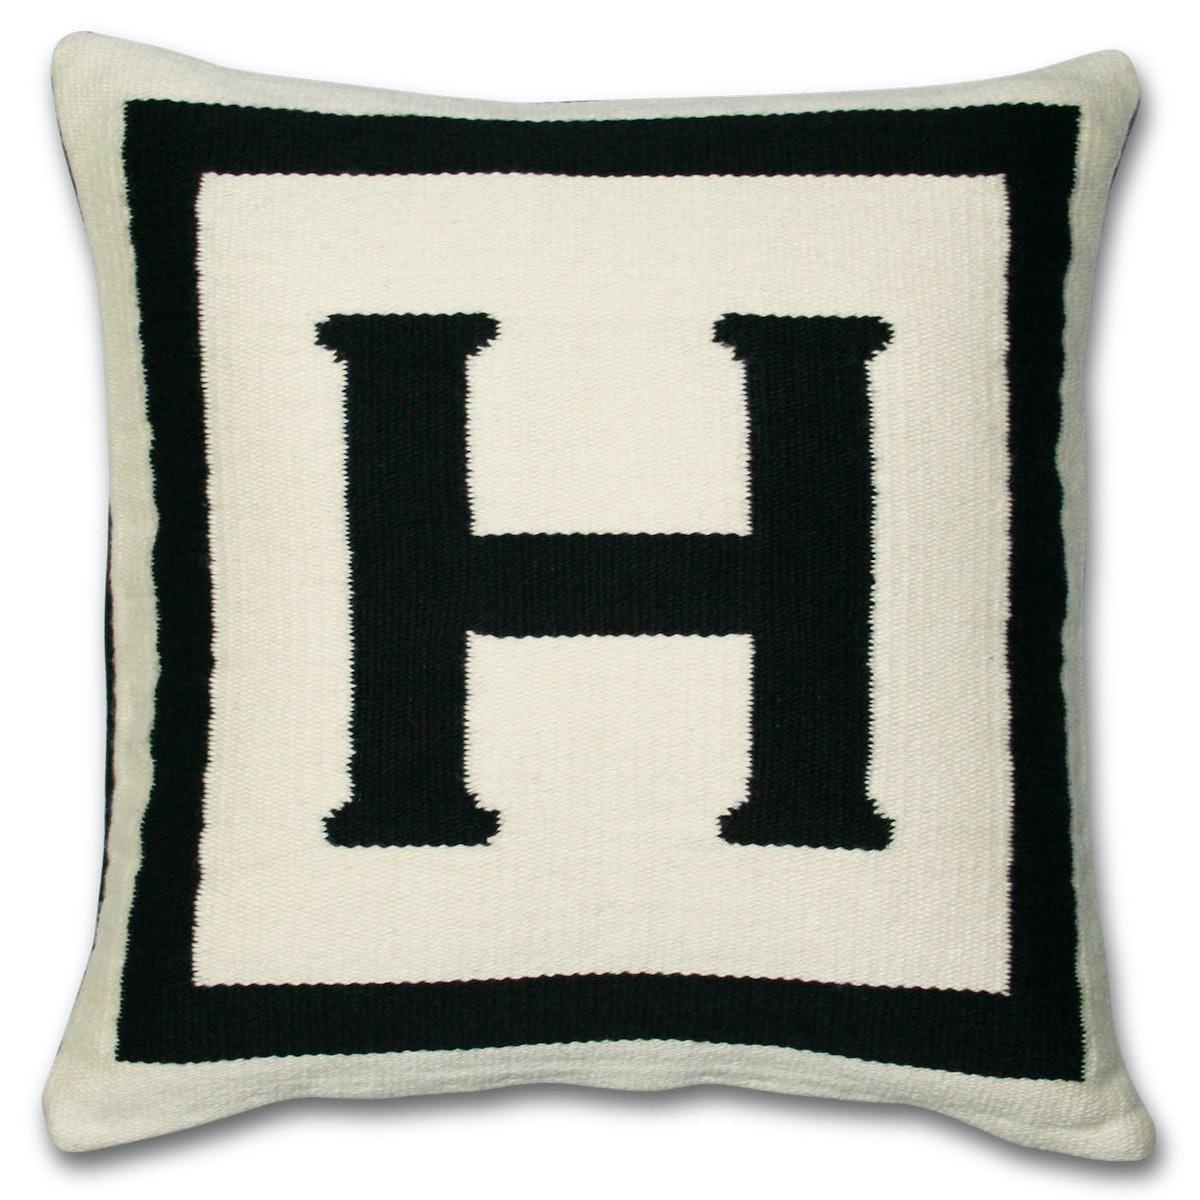 Reversible Letter Throw Pillow